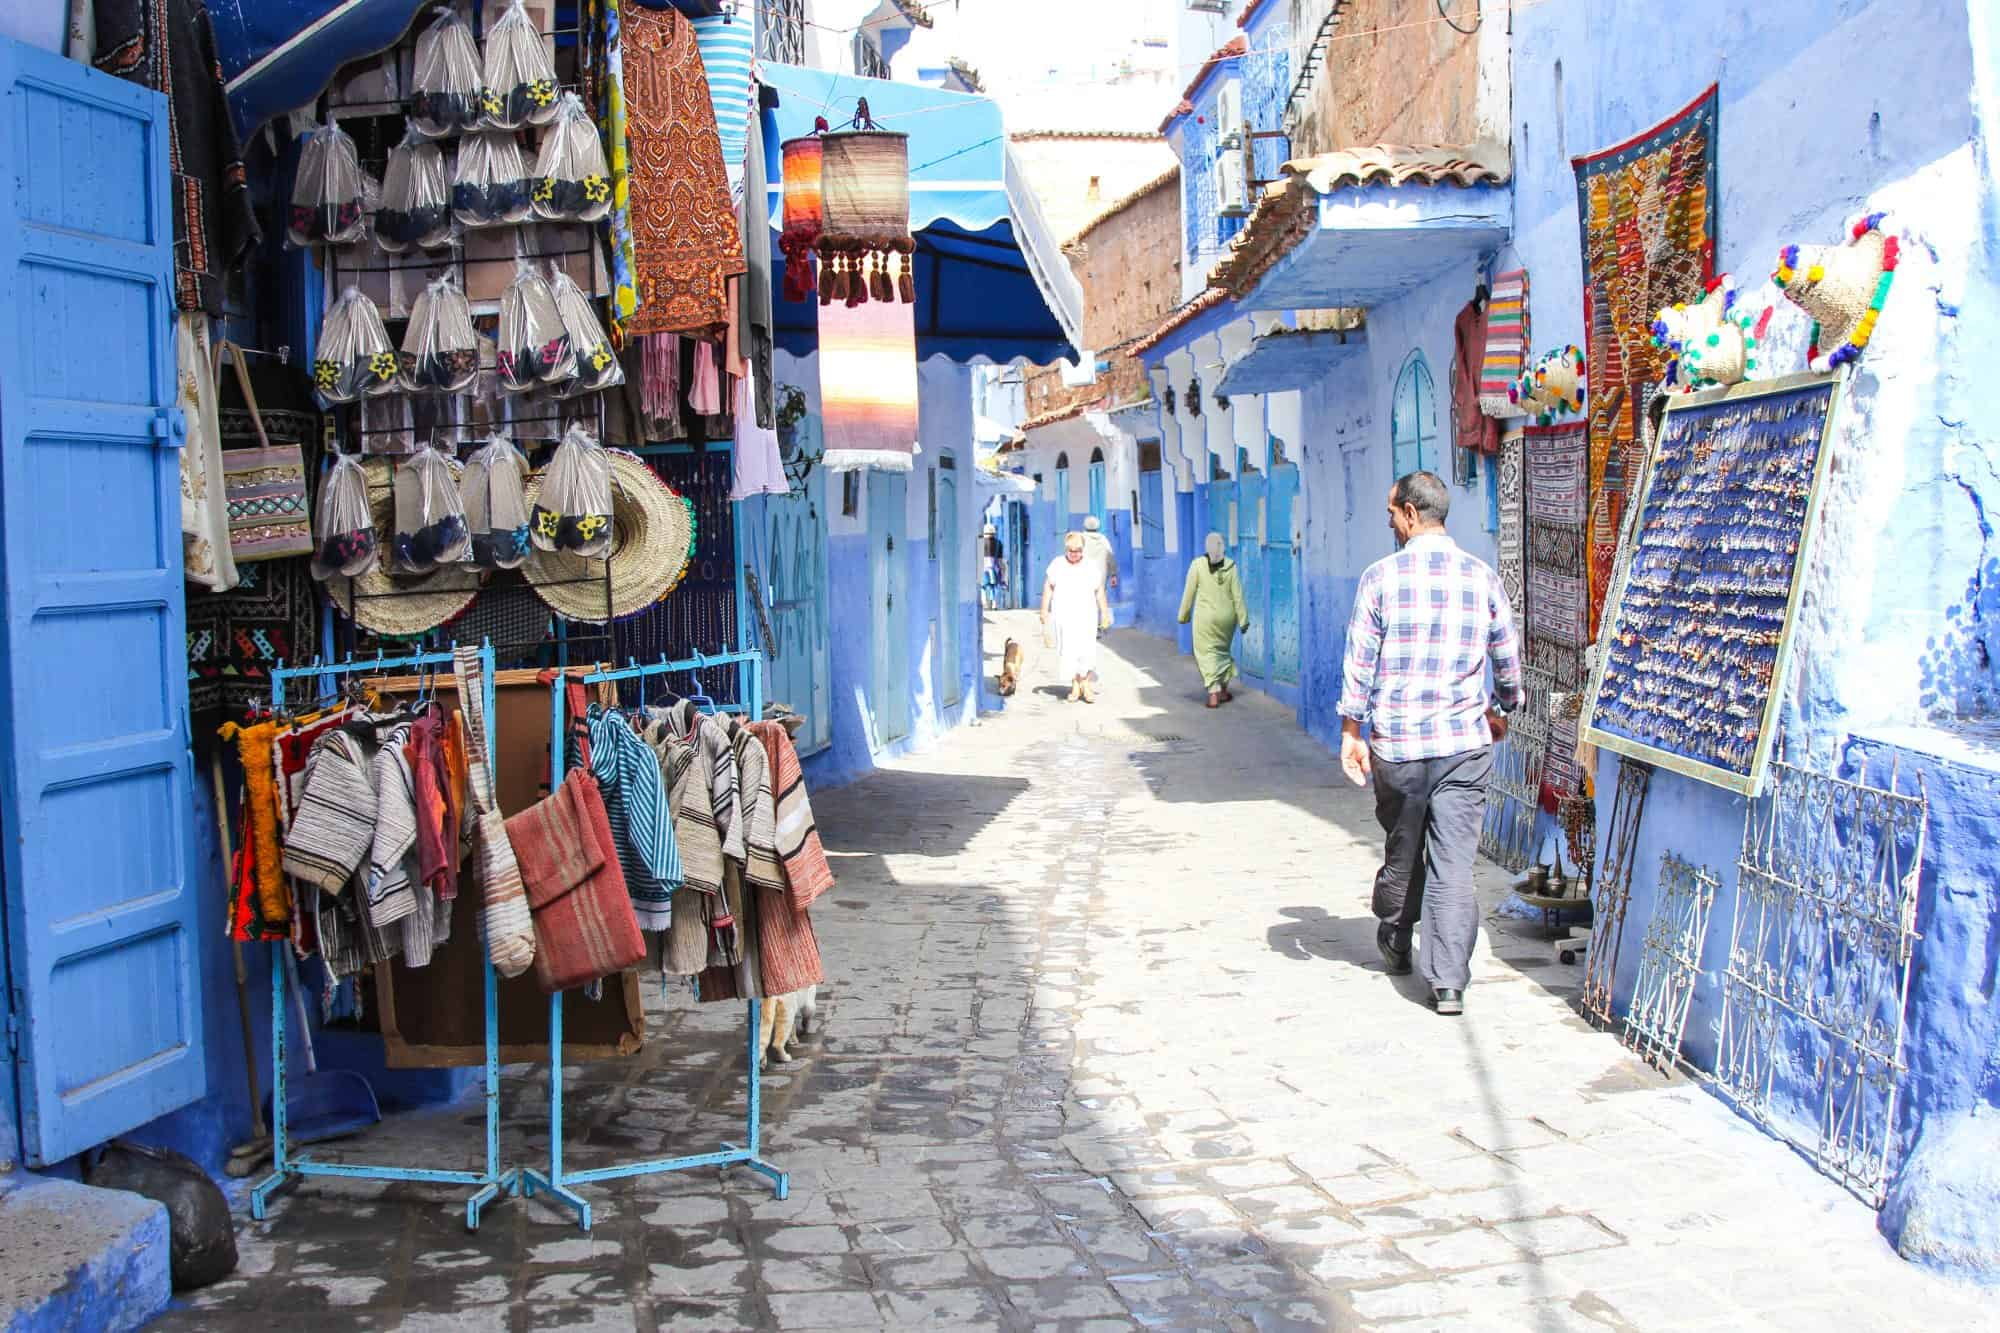 Street Markets Chefchaouen Morocco Blue City